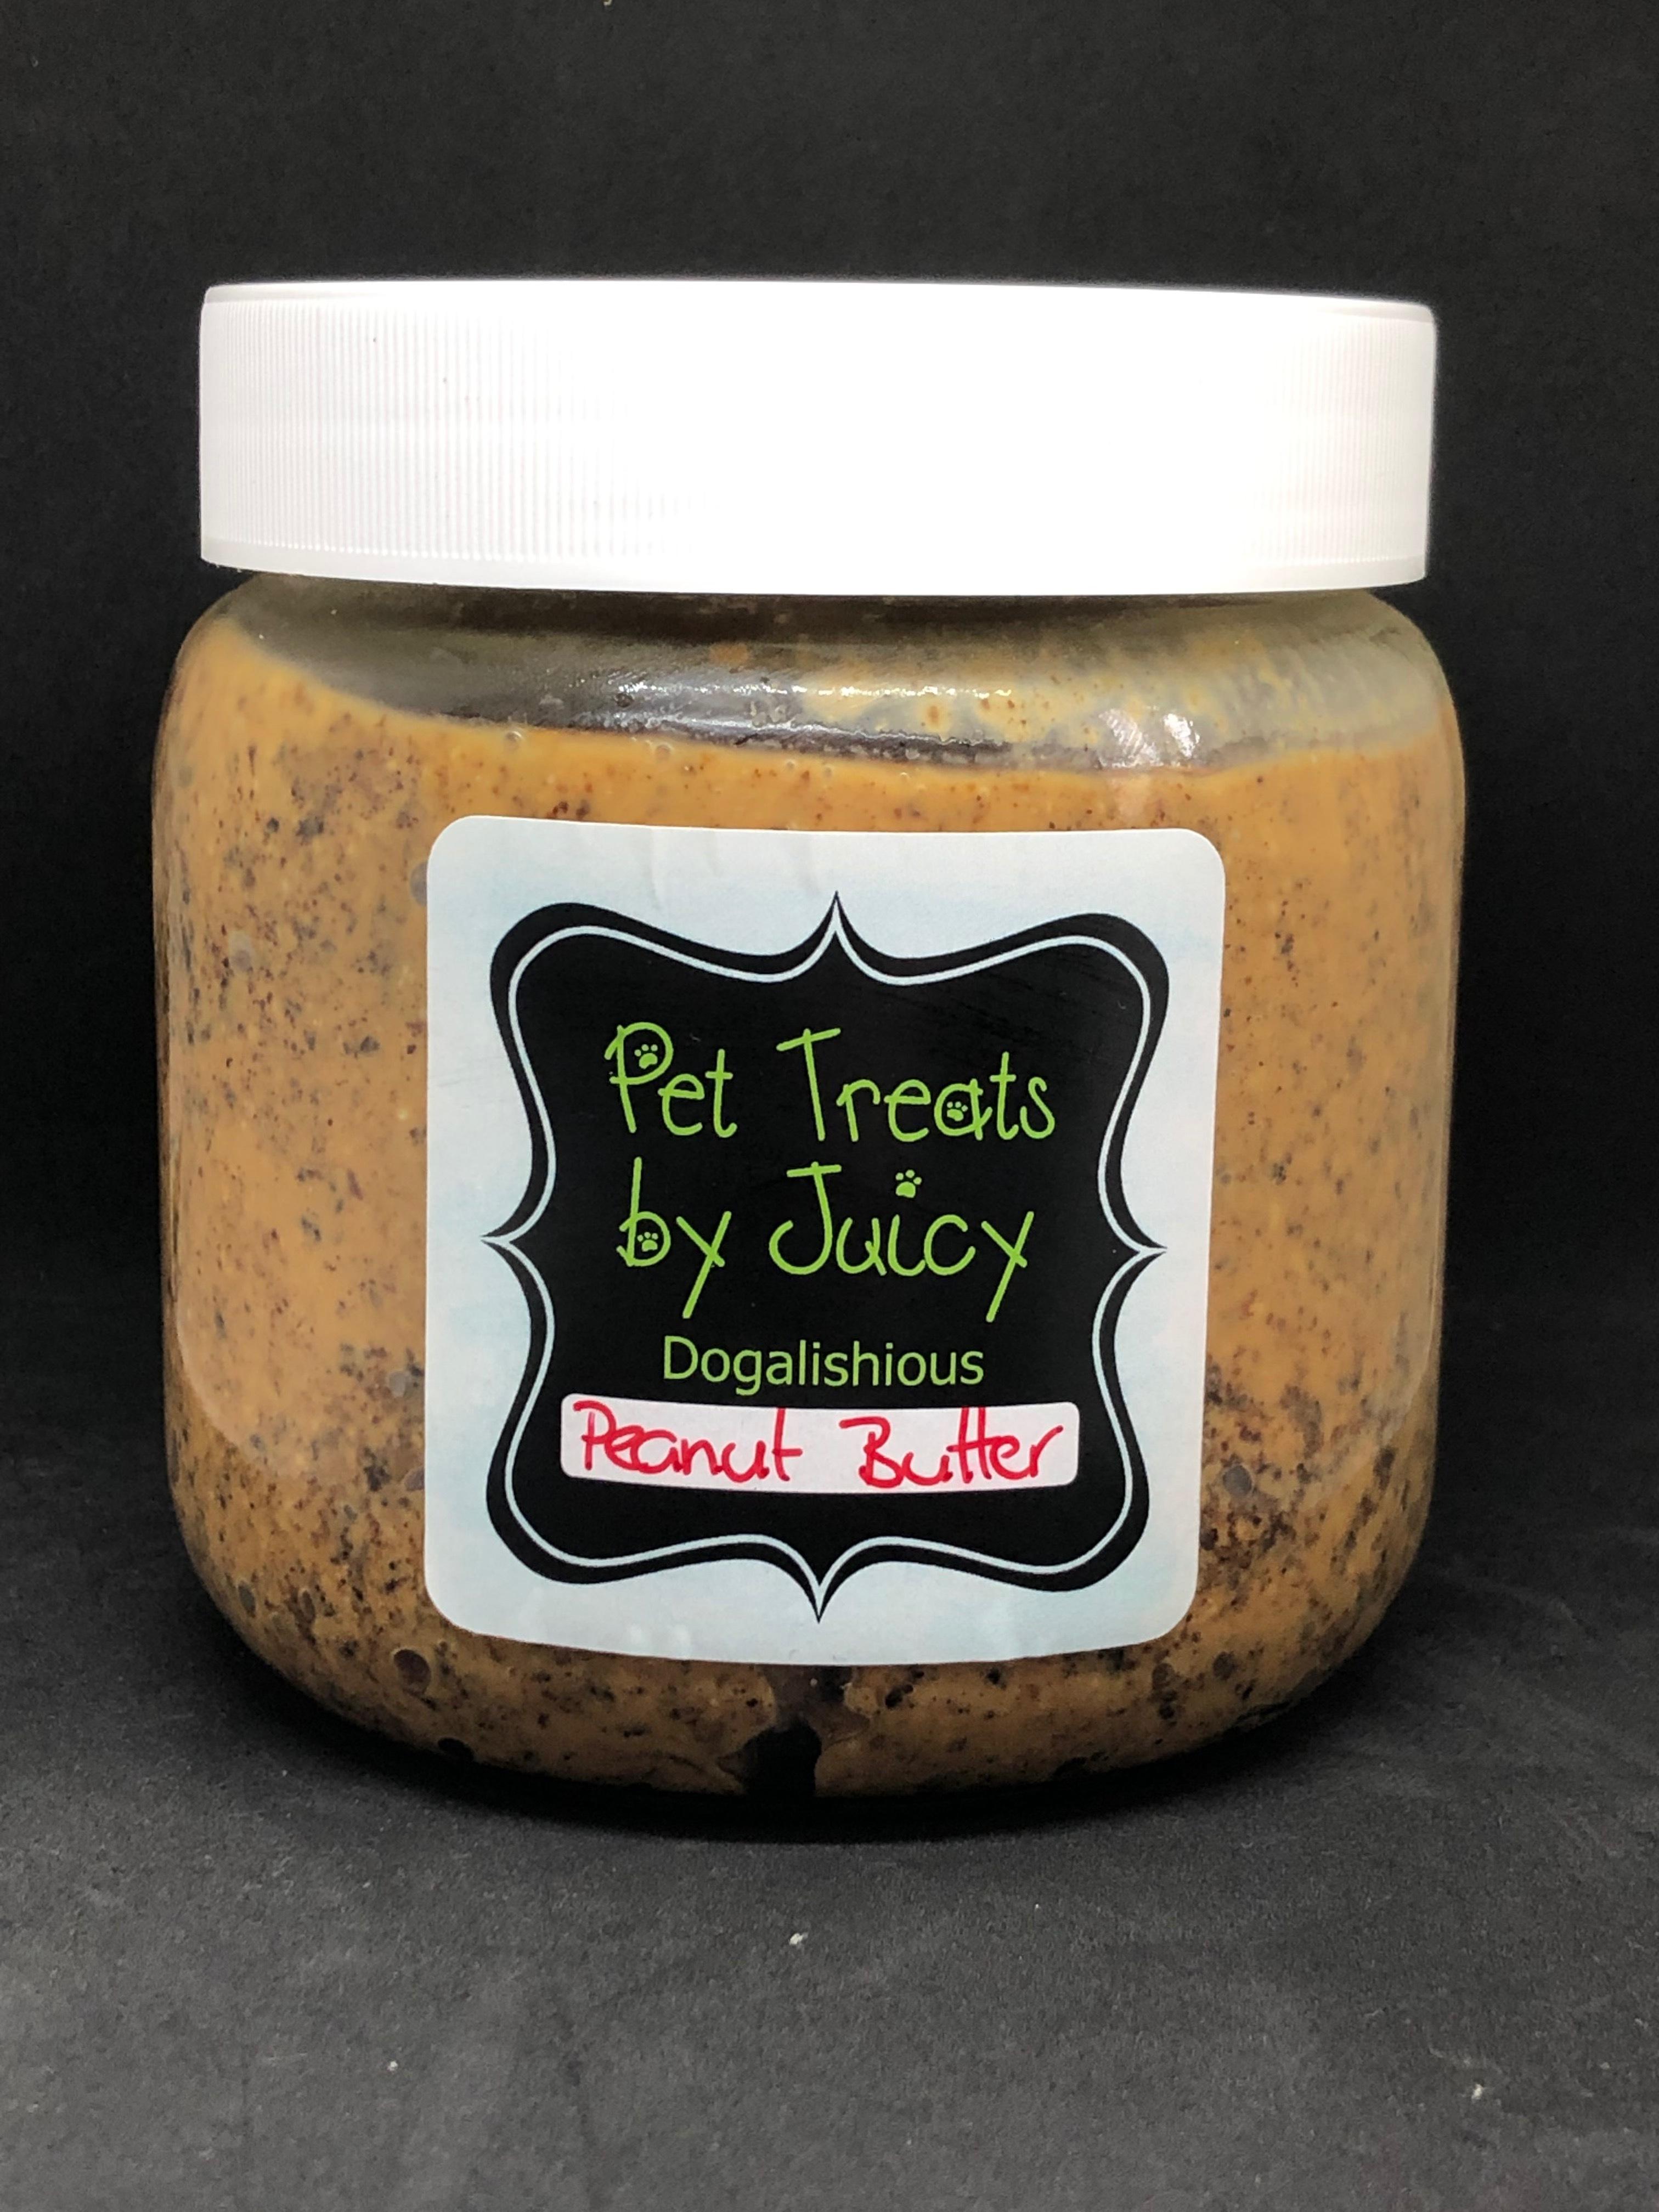 Doggie Peanut Butter 500g doggie-peanut-butter1